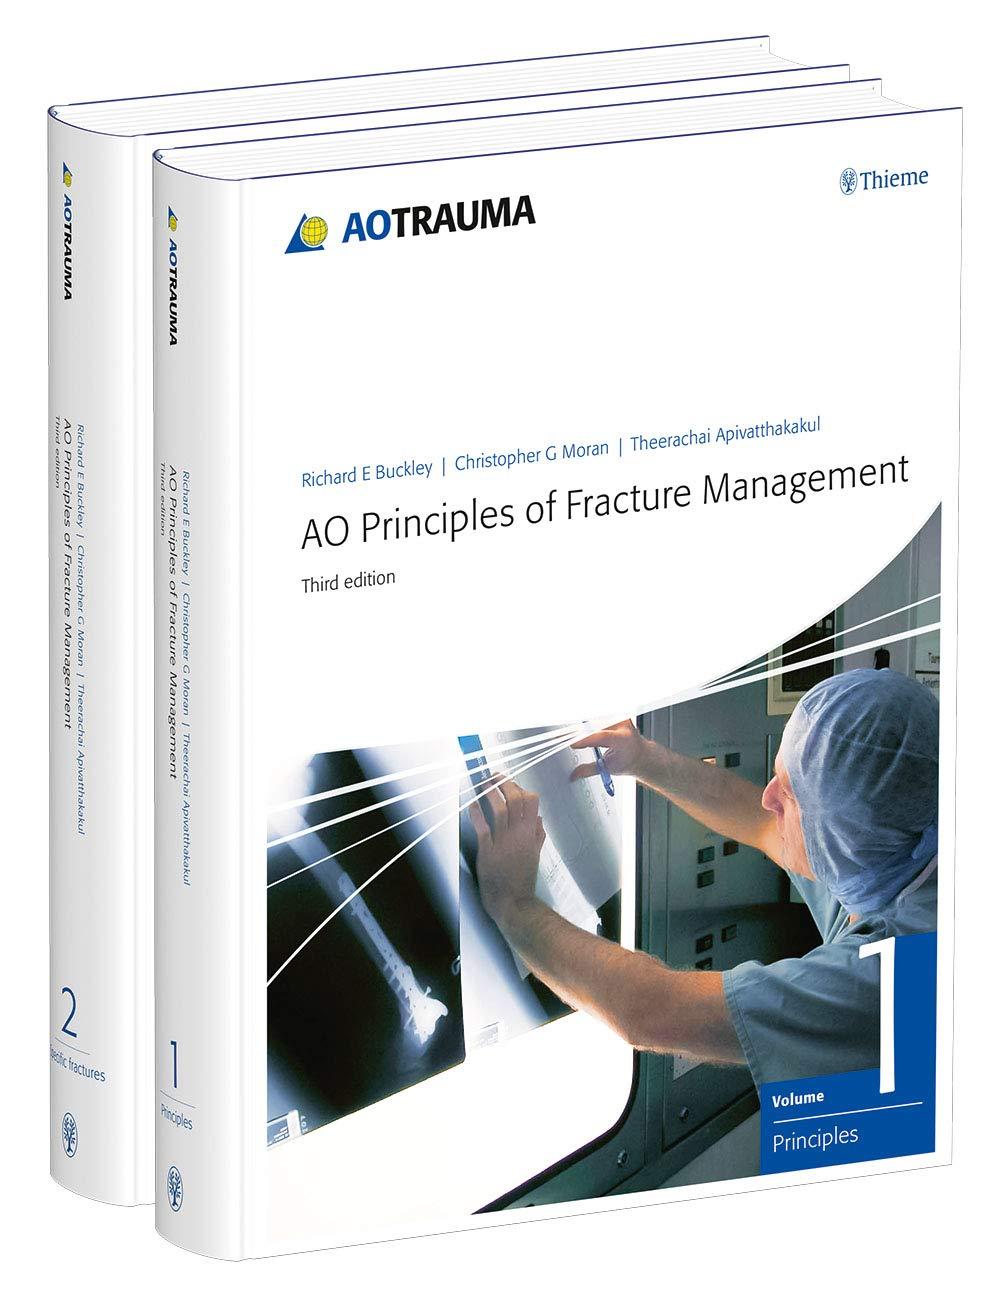 Livro Ao Principles of Fracture Management